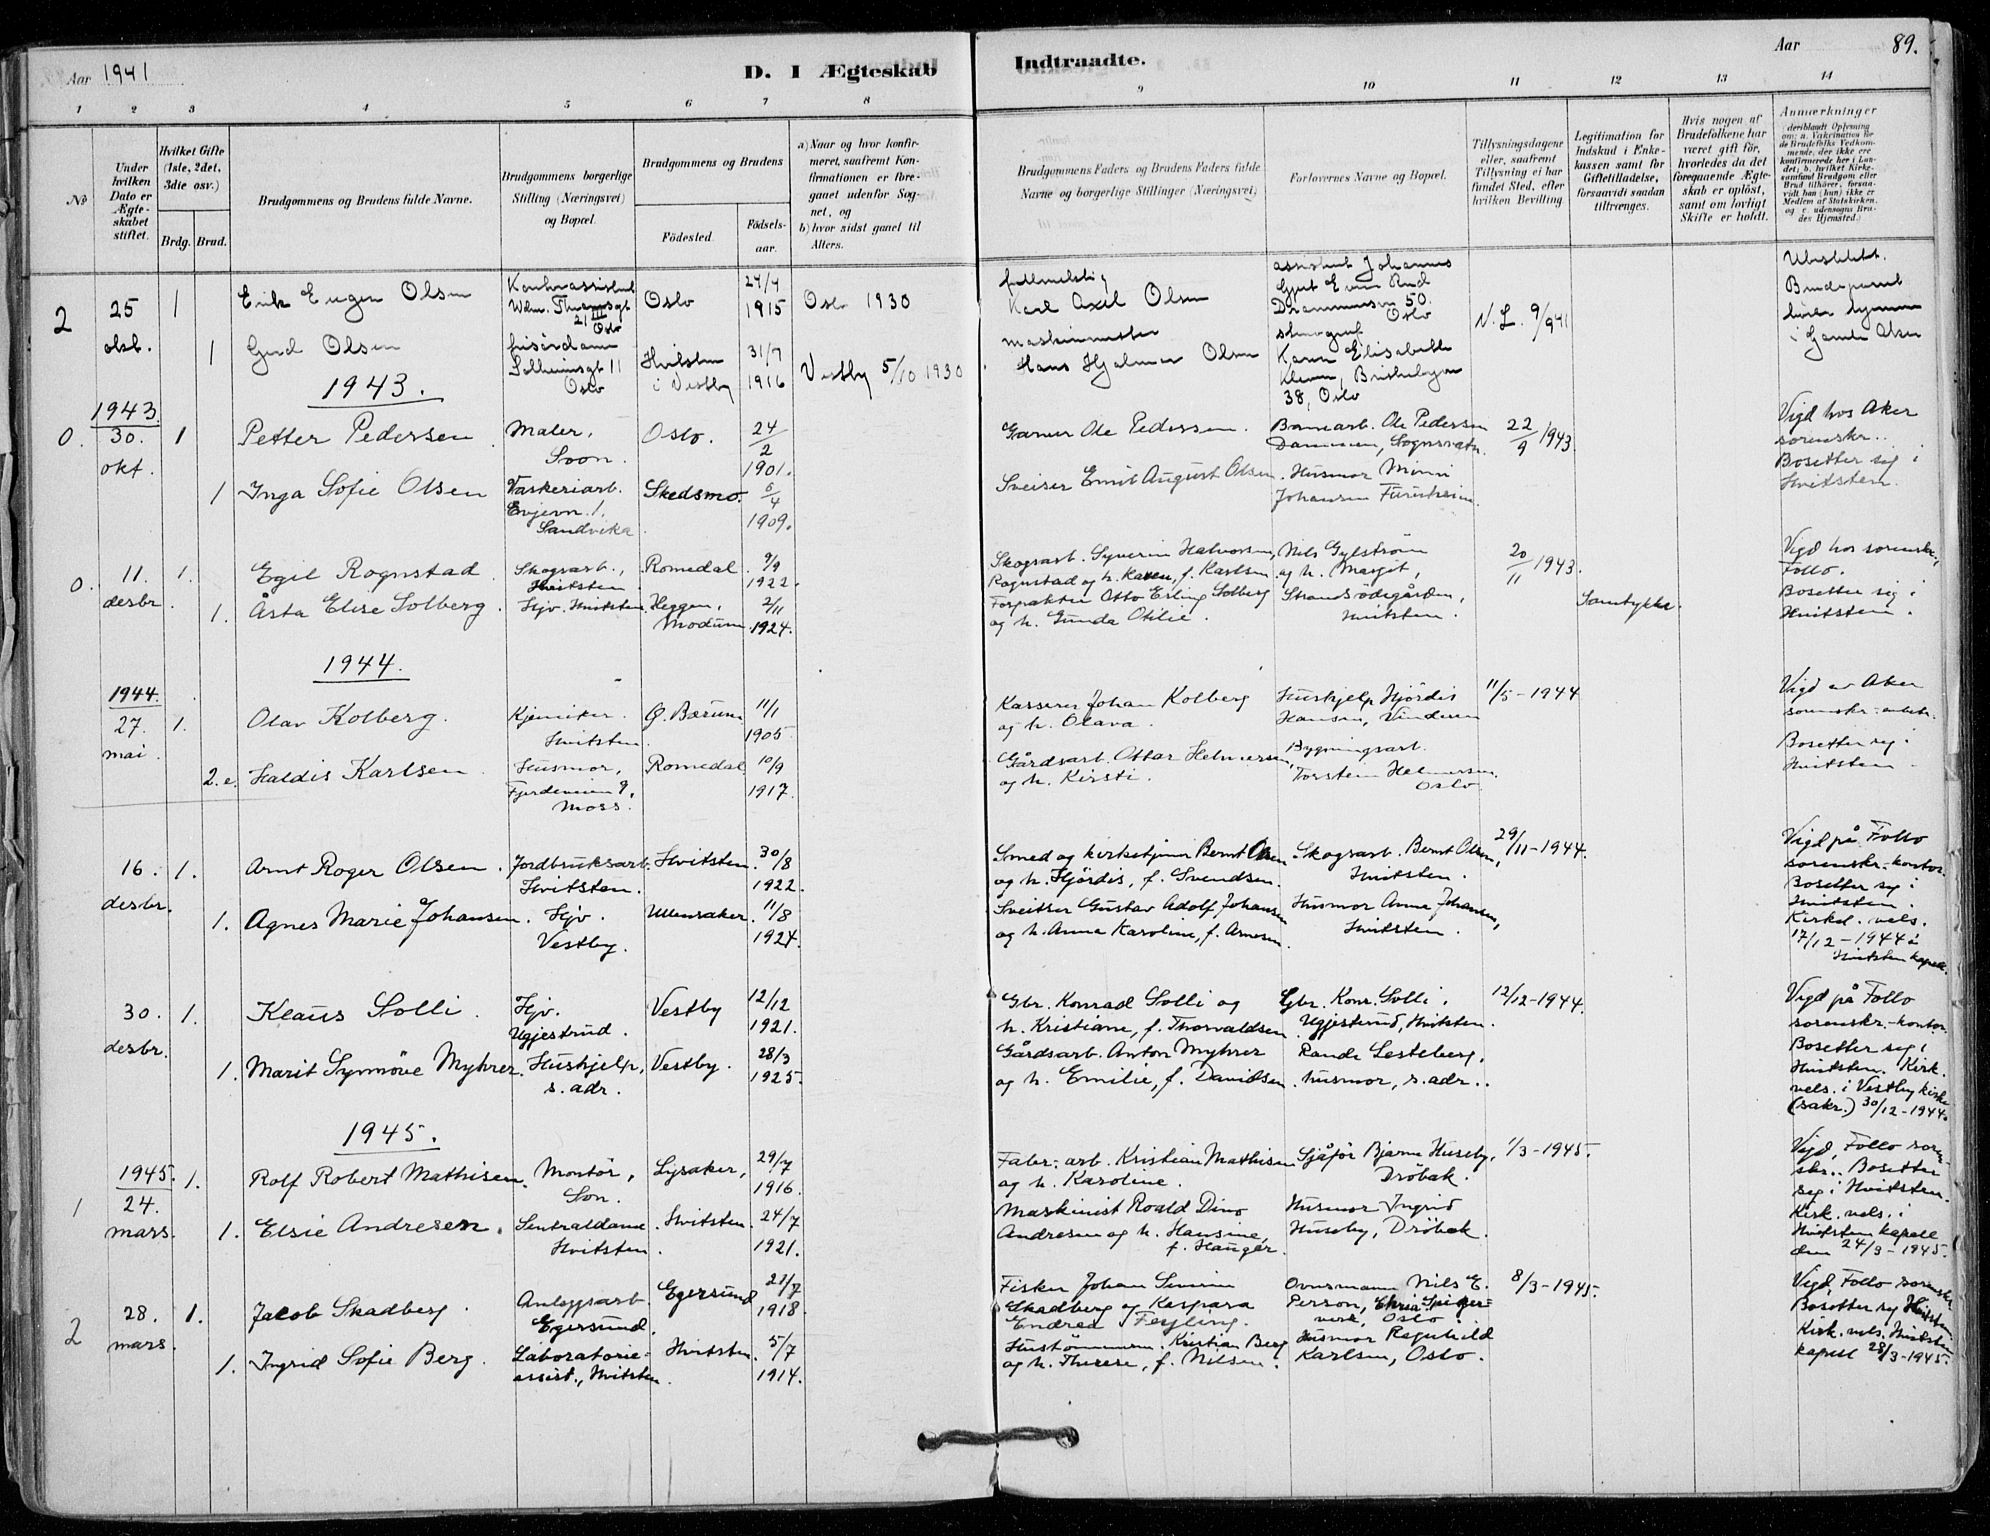 SAO, Vestby prestekontor Kirkebøker, F/Fd/L0001: Ministerialbok nr. IV 1, 1878-1945, s. 89